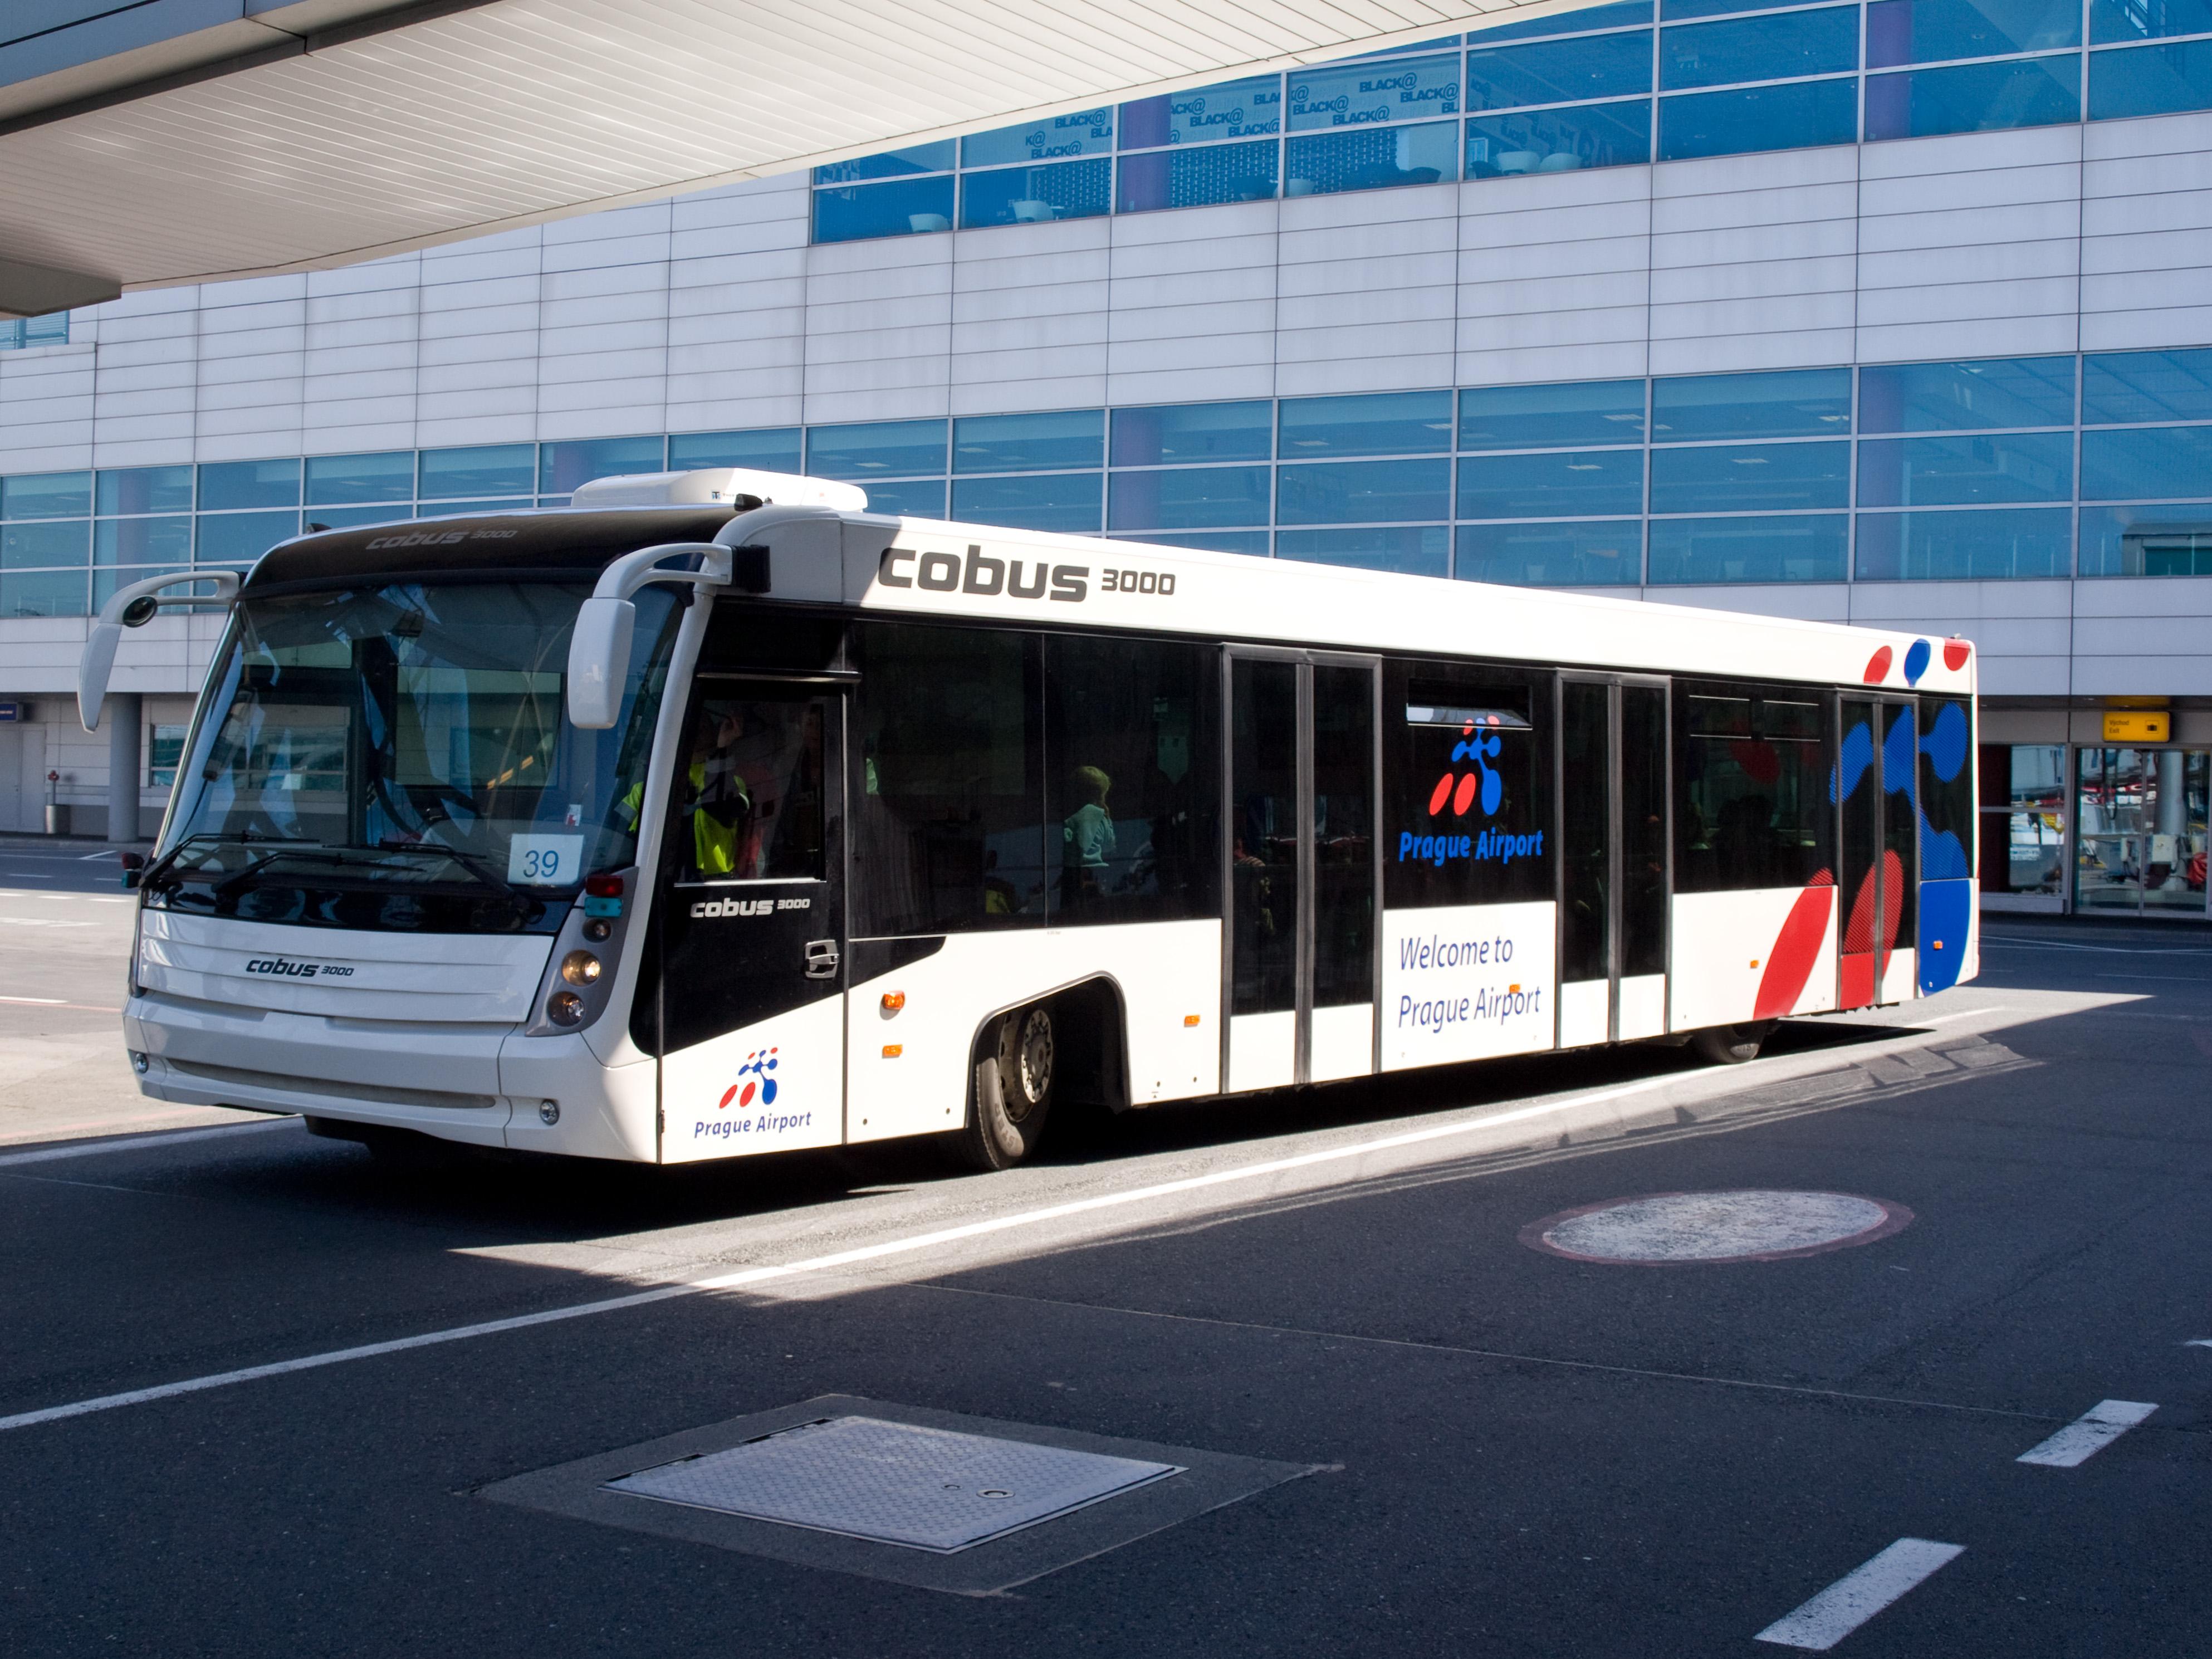 Exkurze_Ruzyn%C4%9B,_autobus_Contrac_Cob